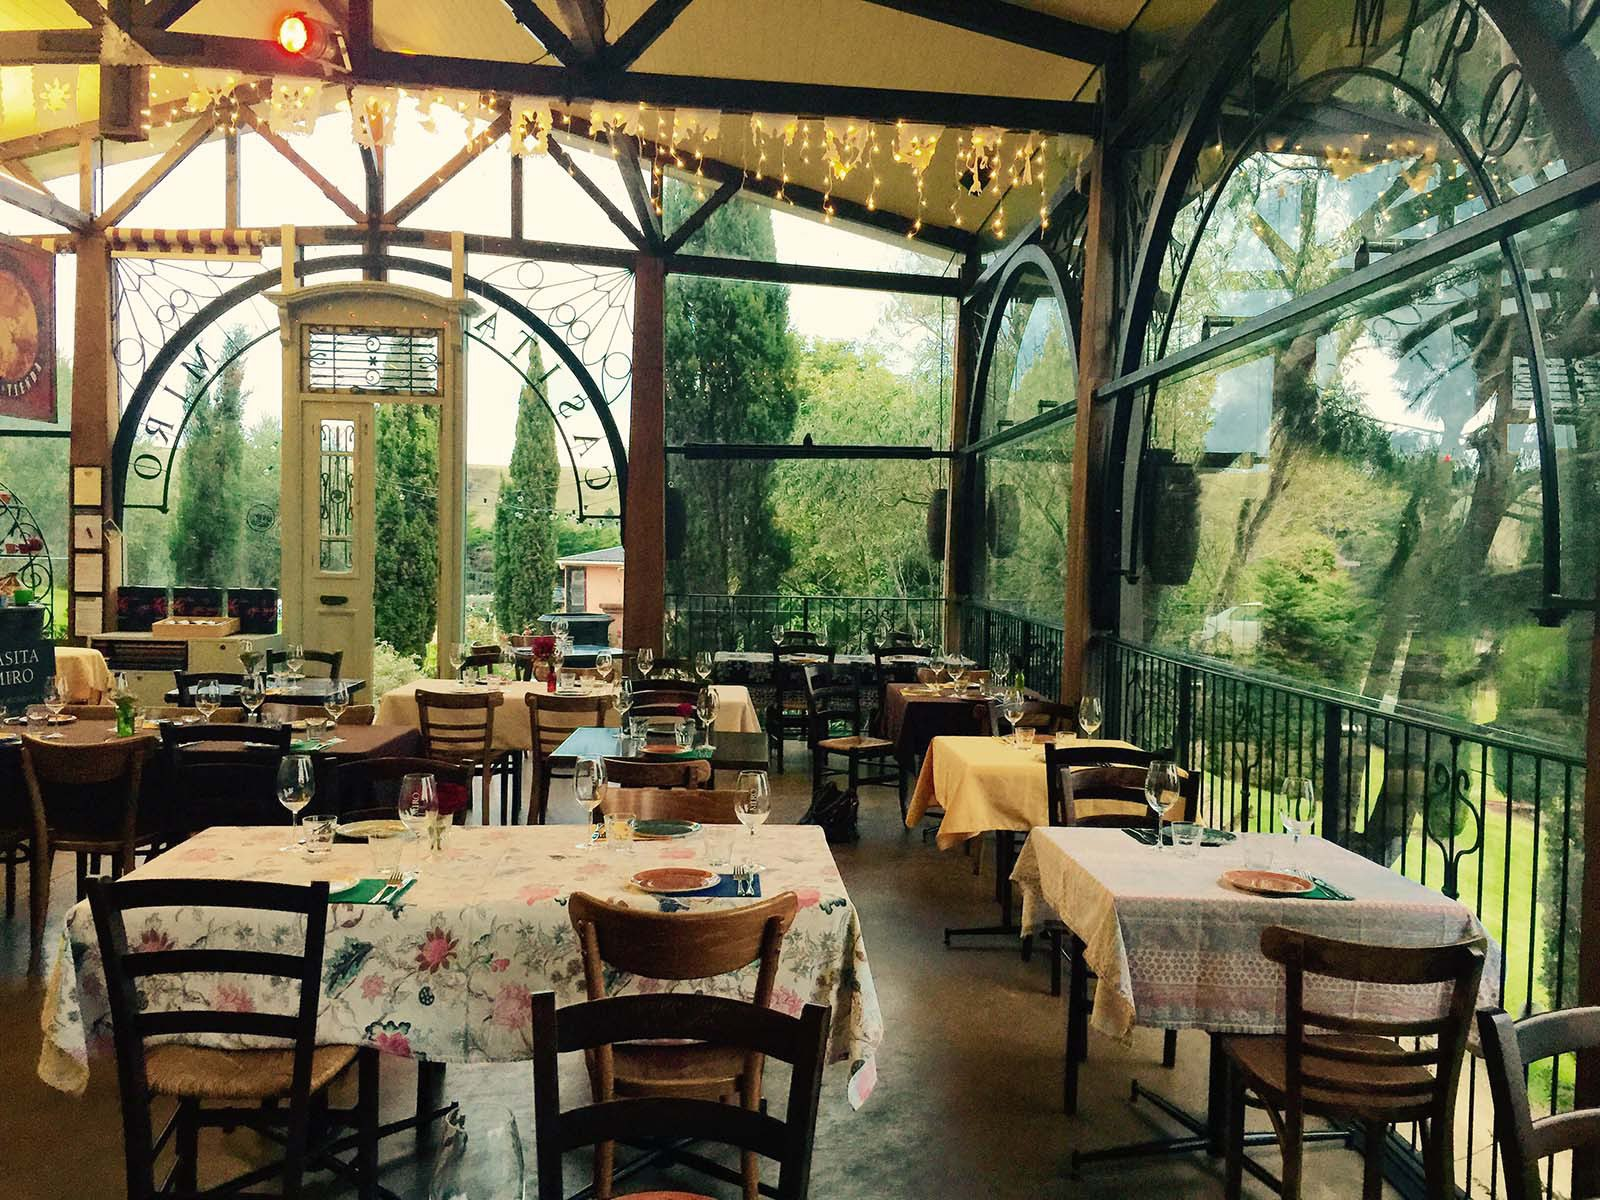 Casita miro green dining